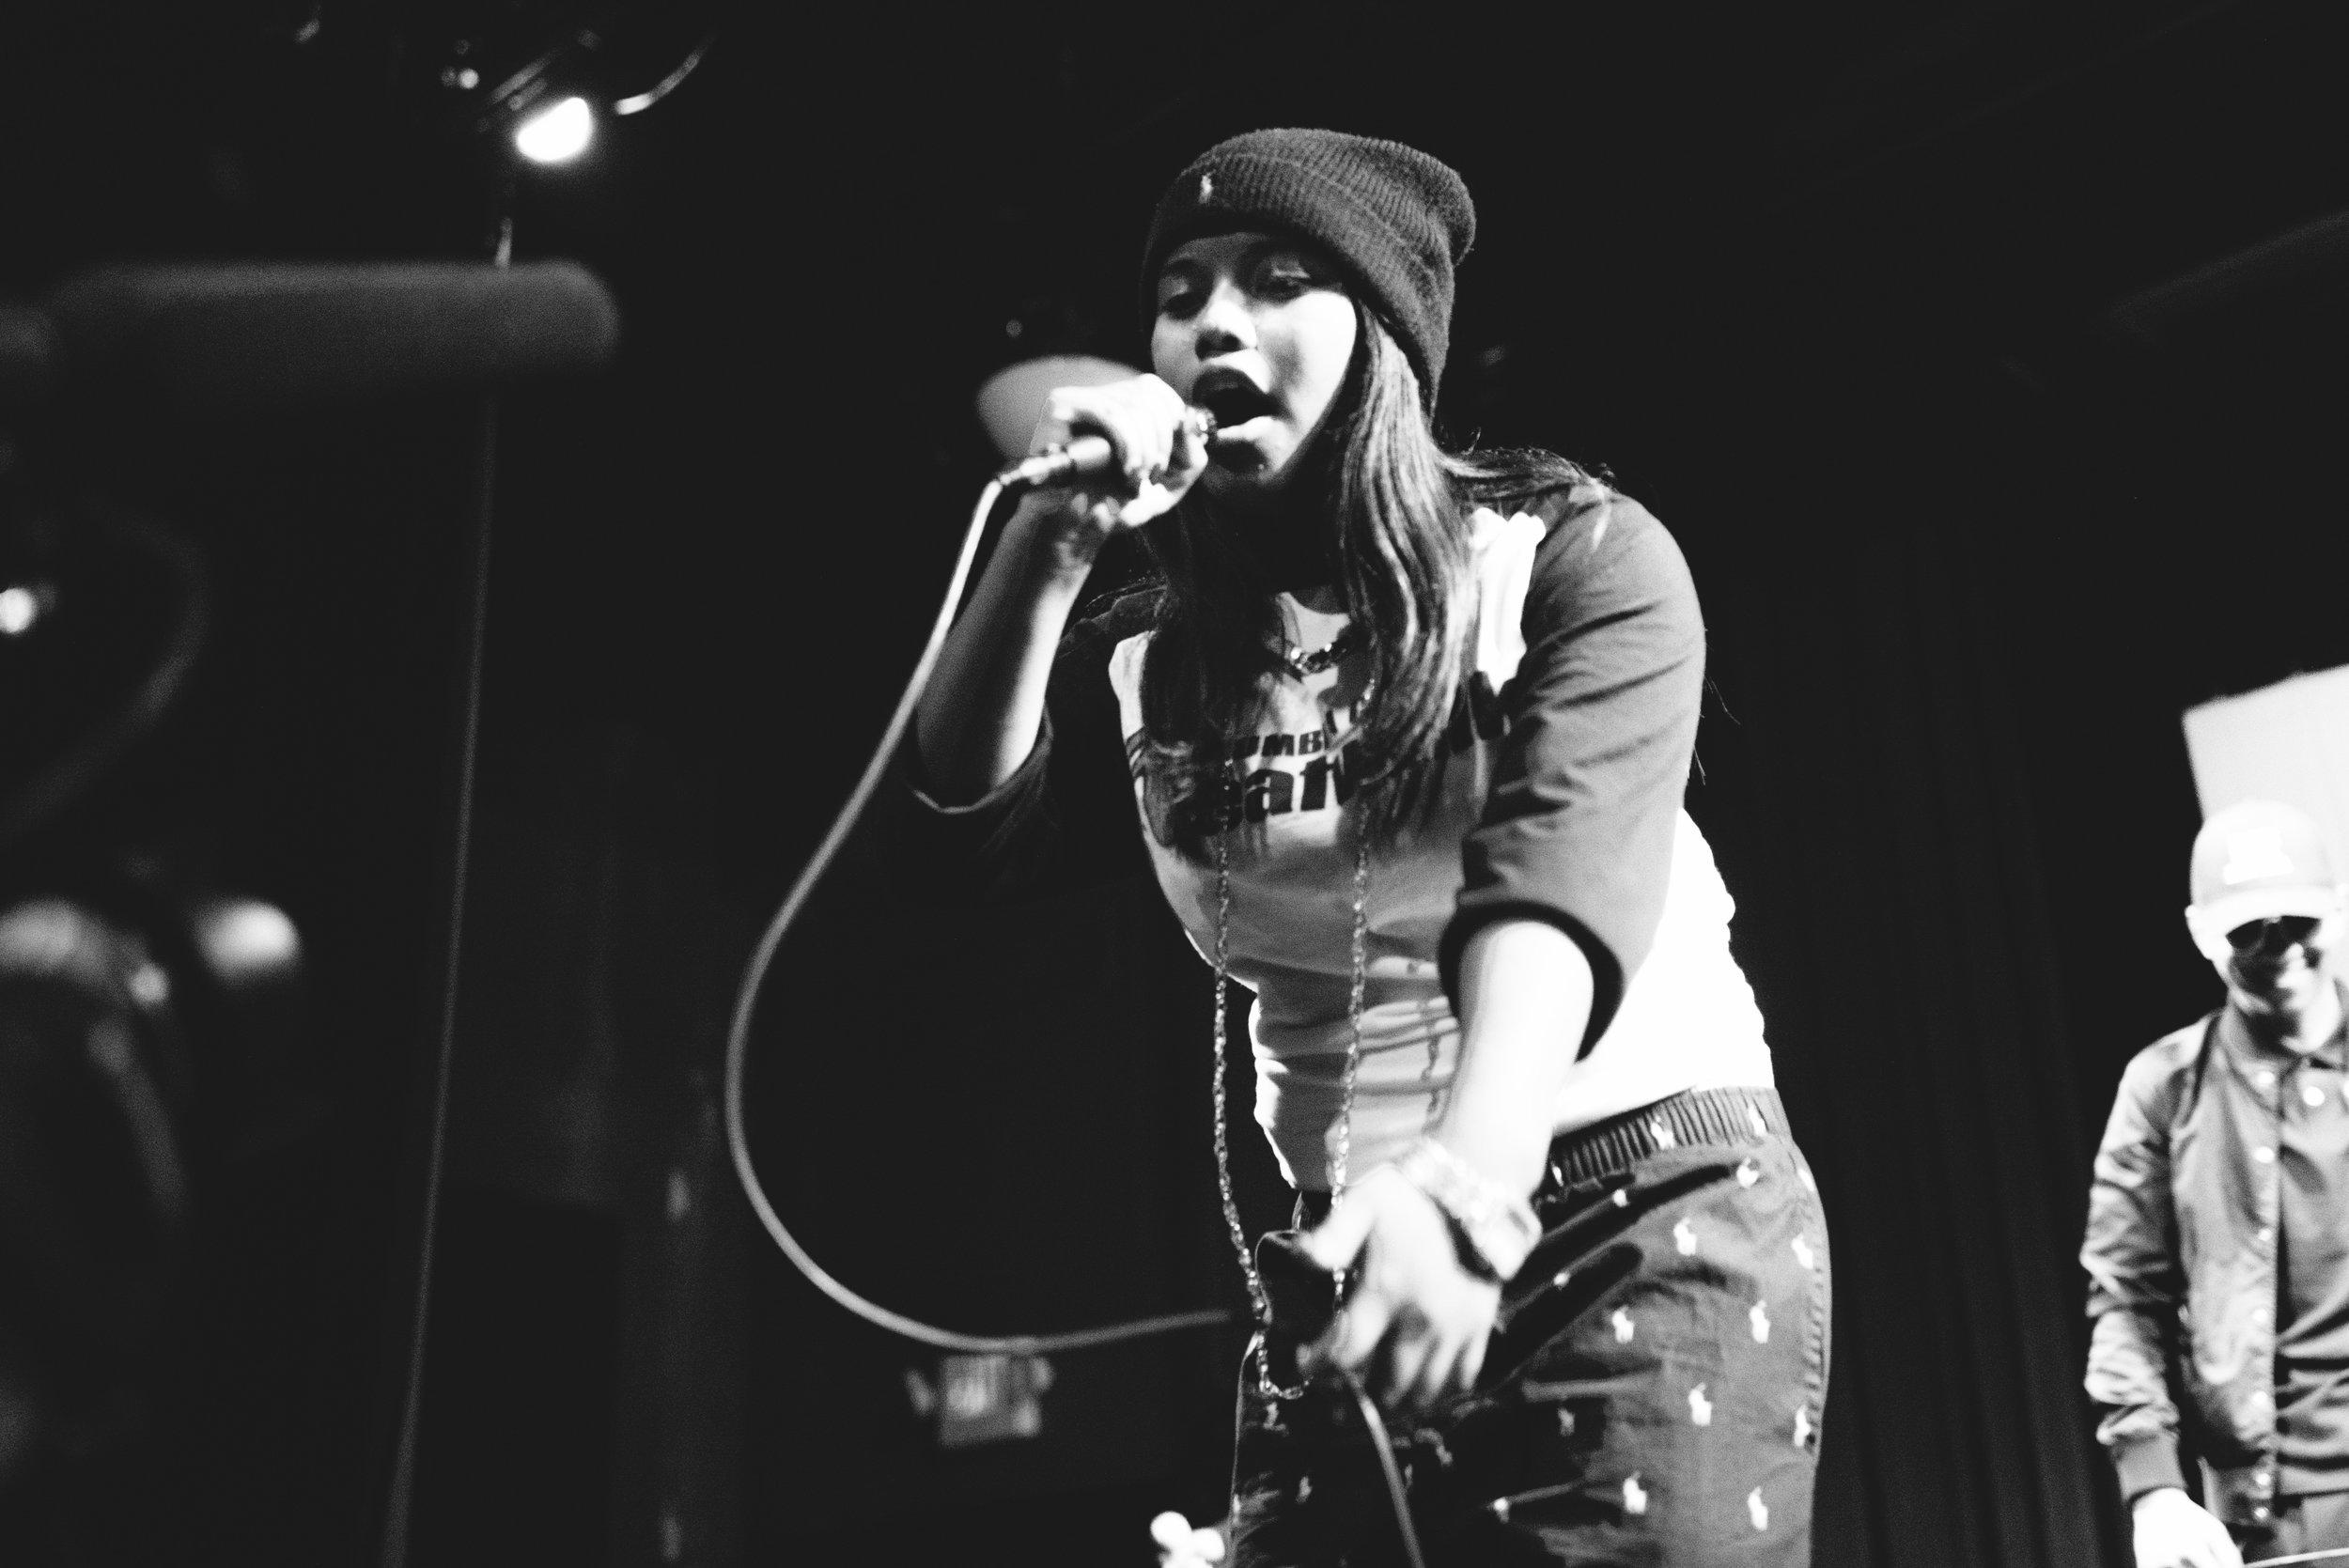 Jewelz Cypher Performing Live.Photo Credit: Amber Zbitnoff